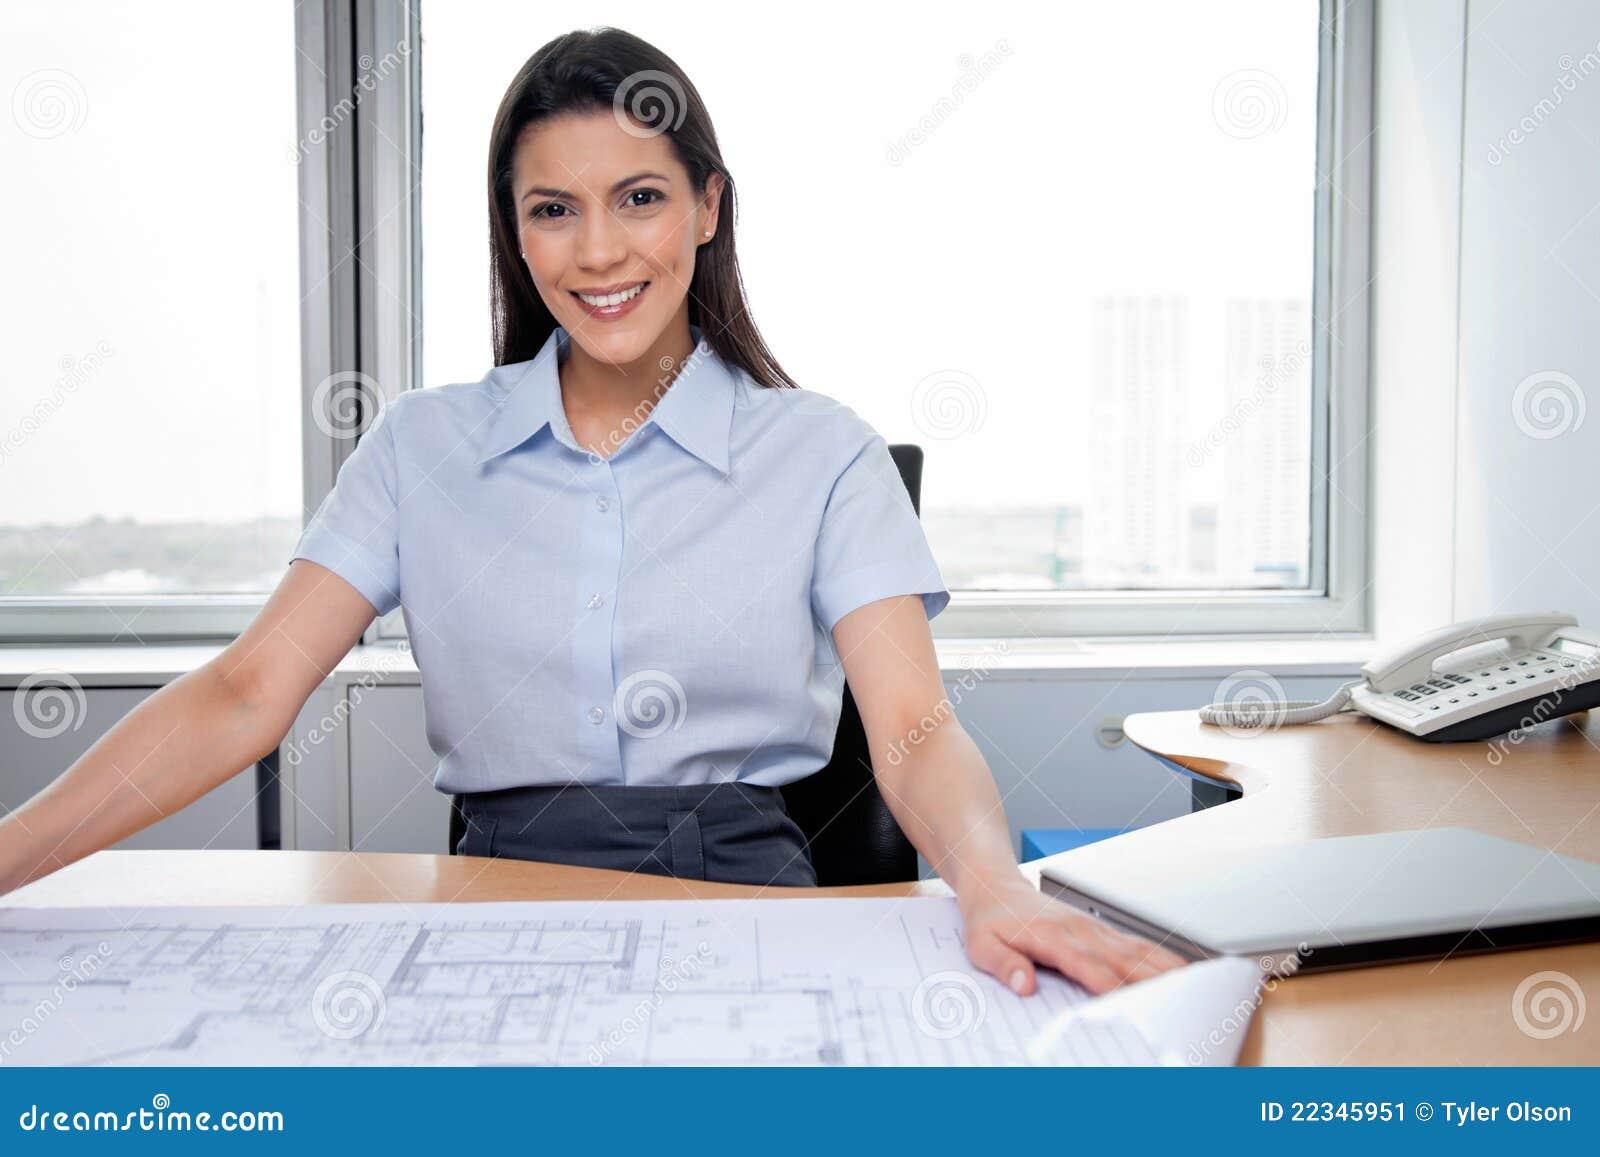 Female architect sitting with blueprints on desk stock for Architecte desl definition